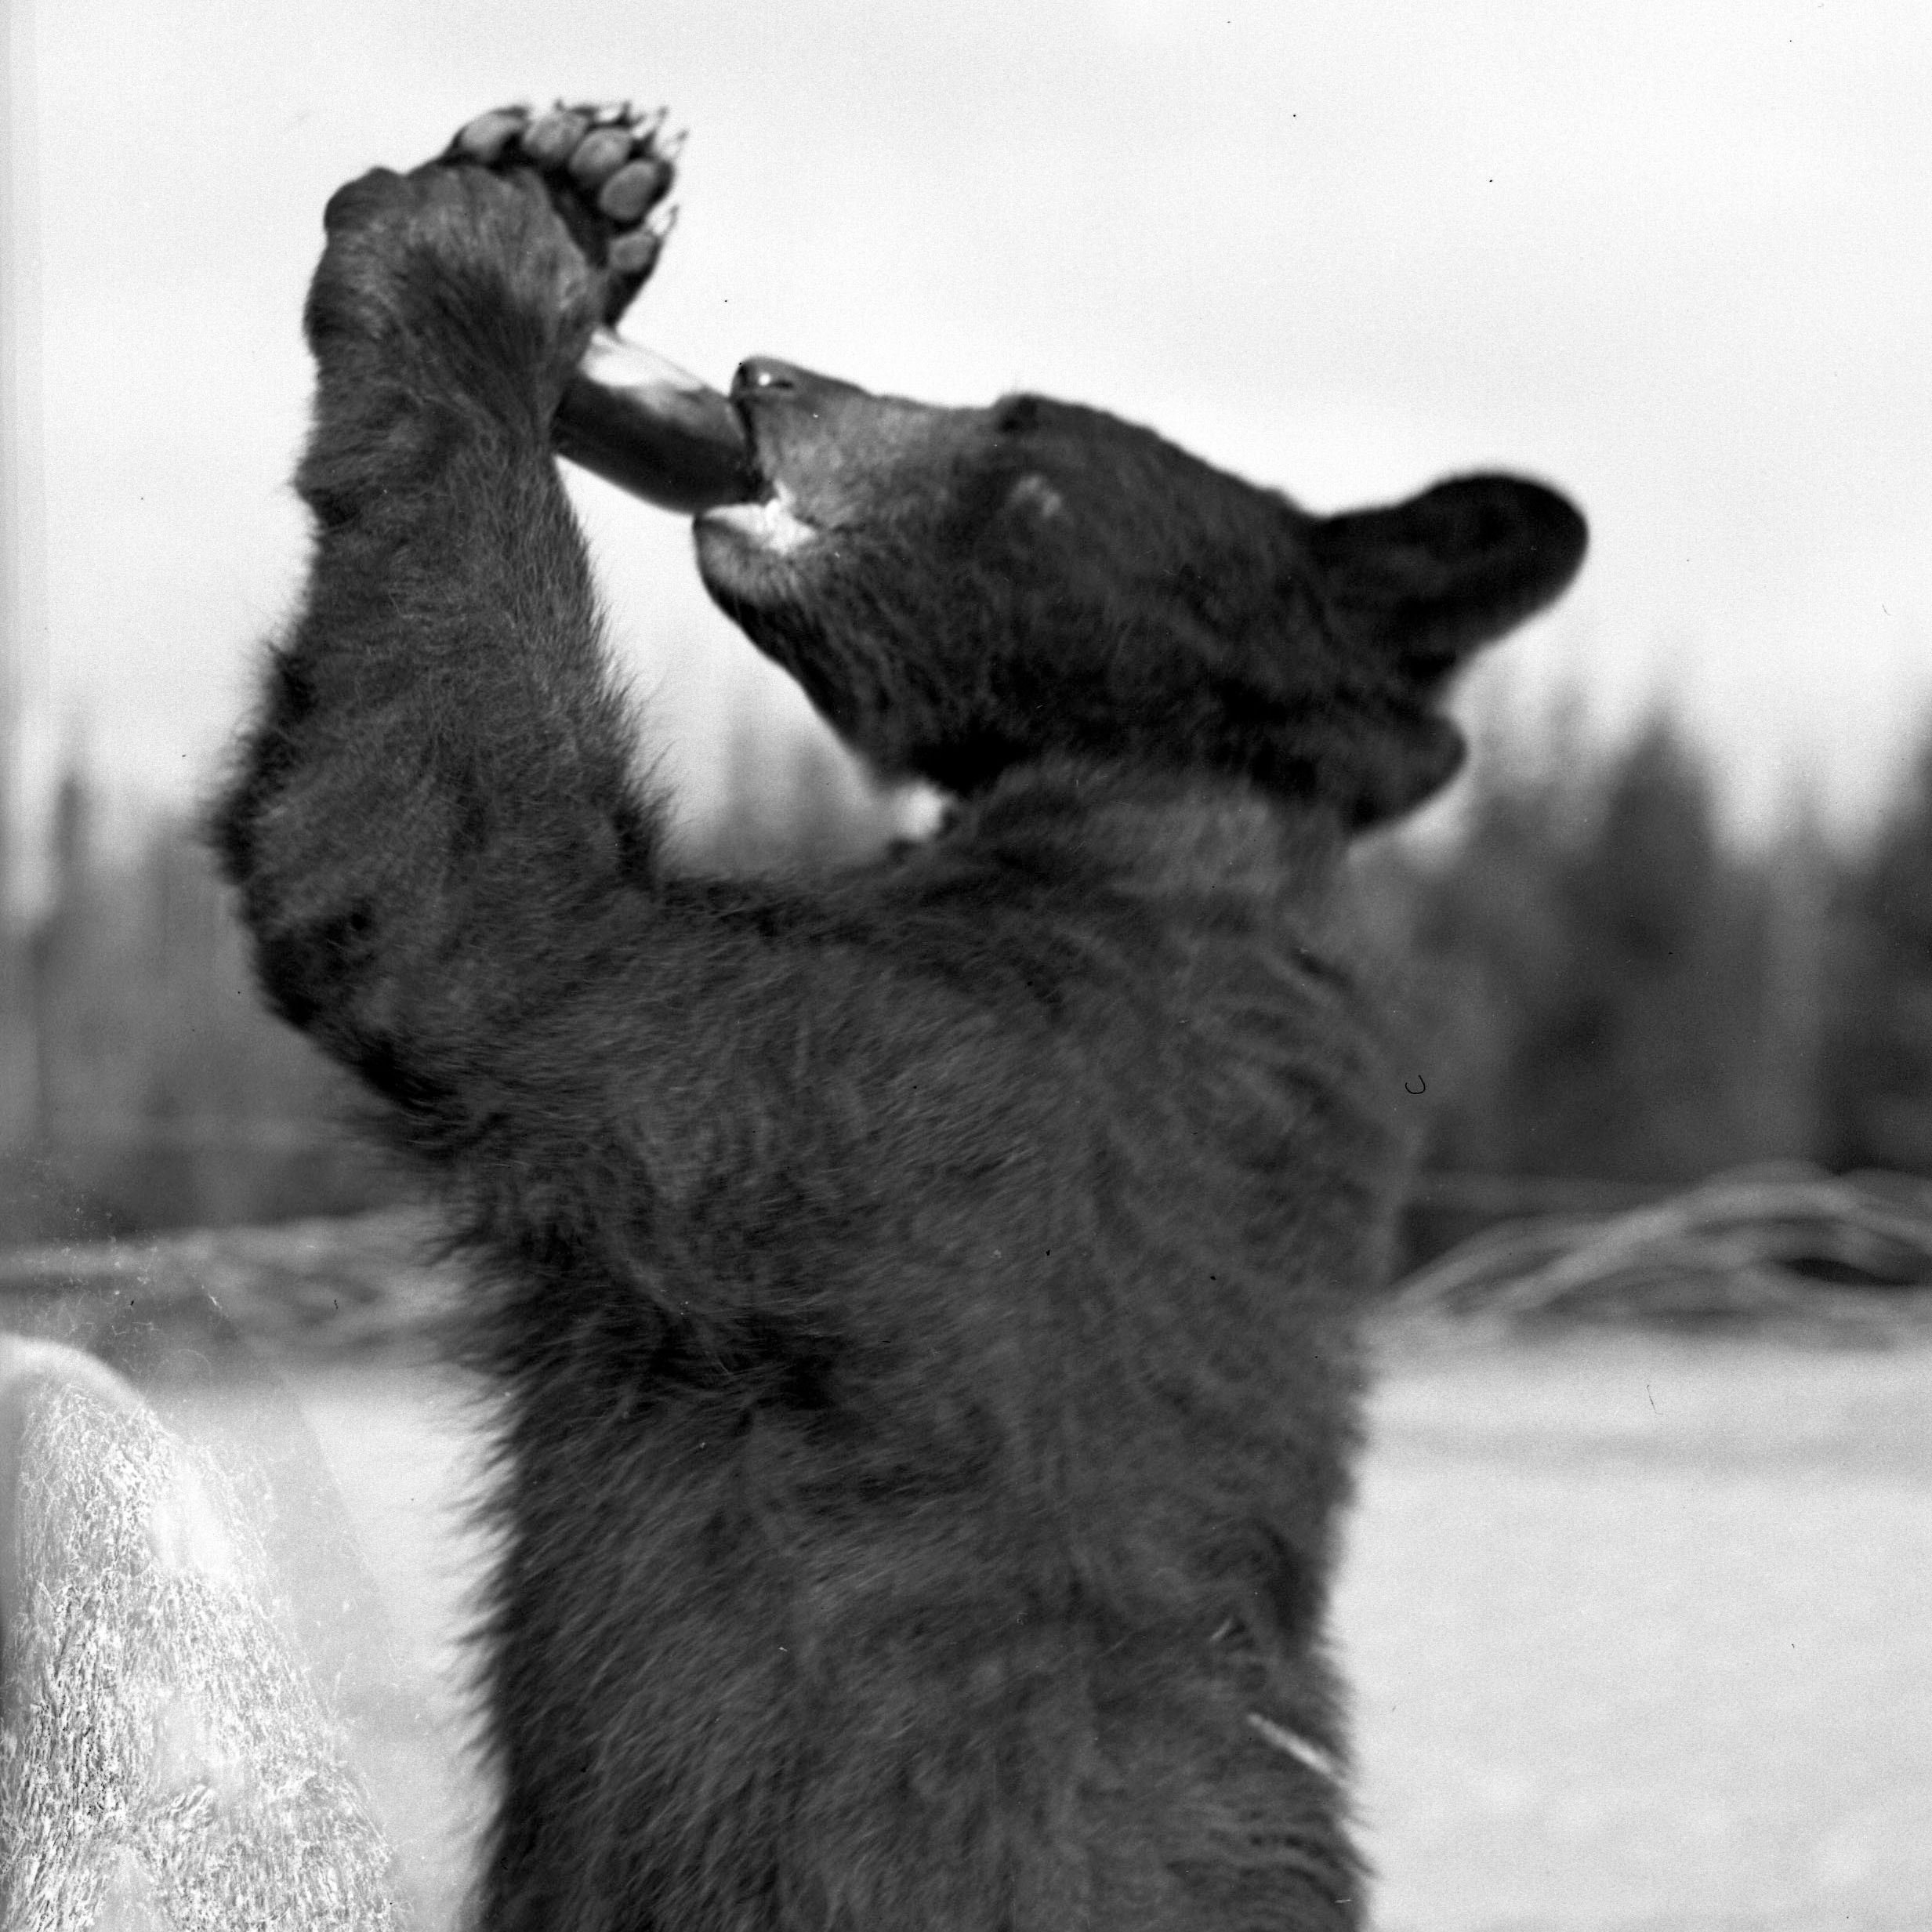 Bear drinking soda (Cropped)